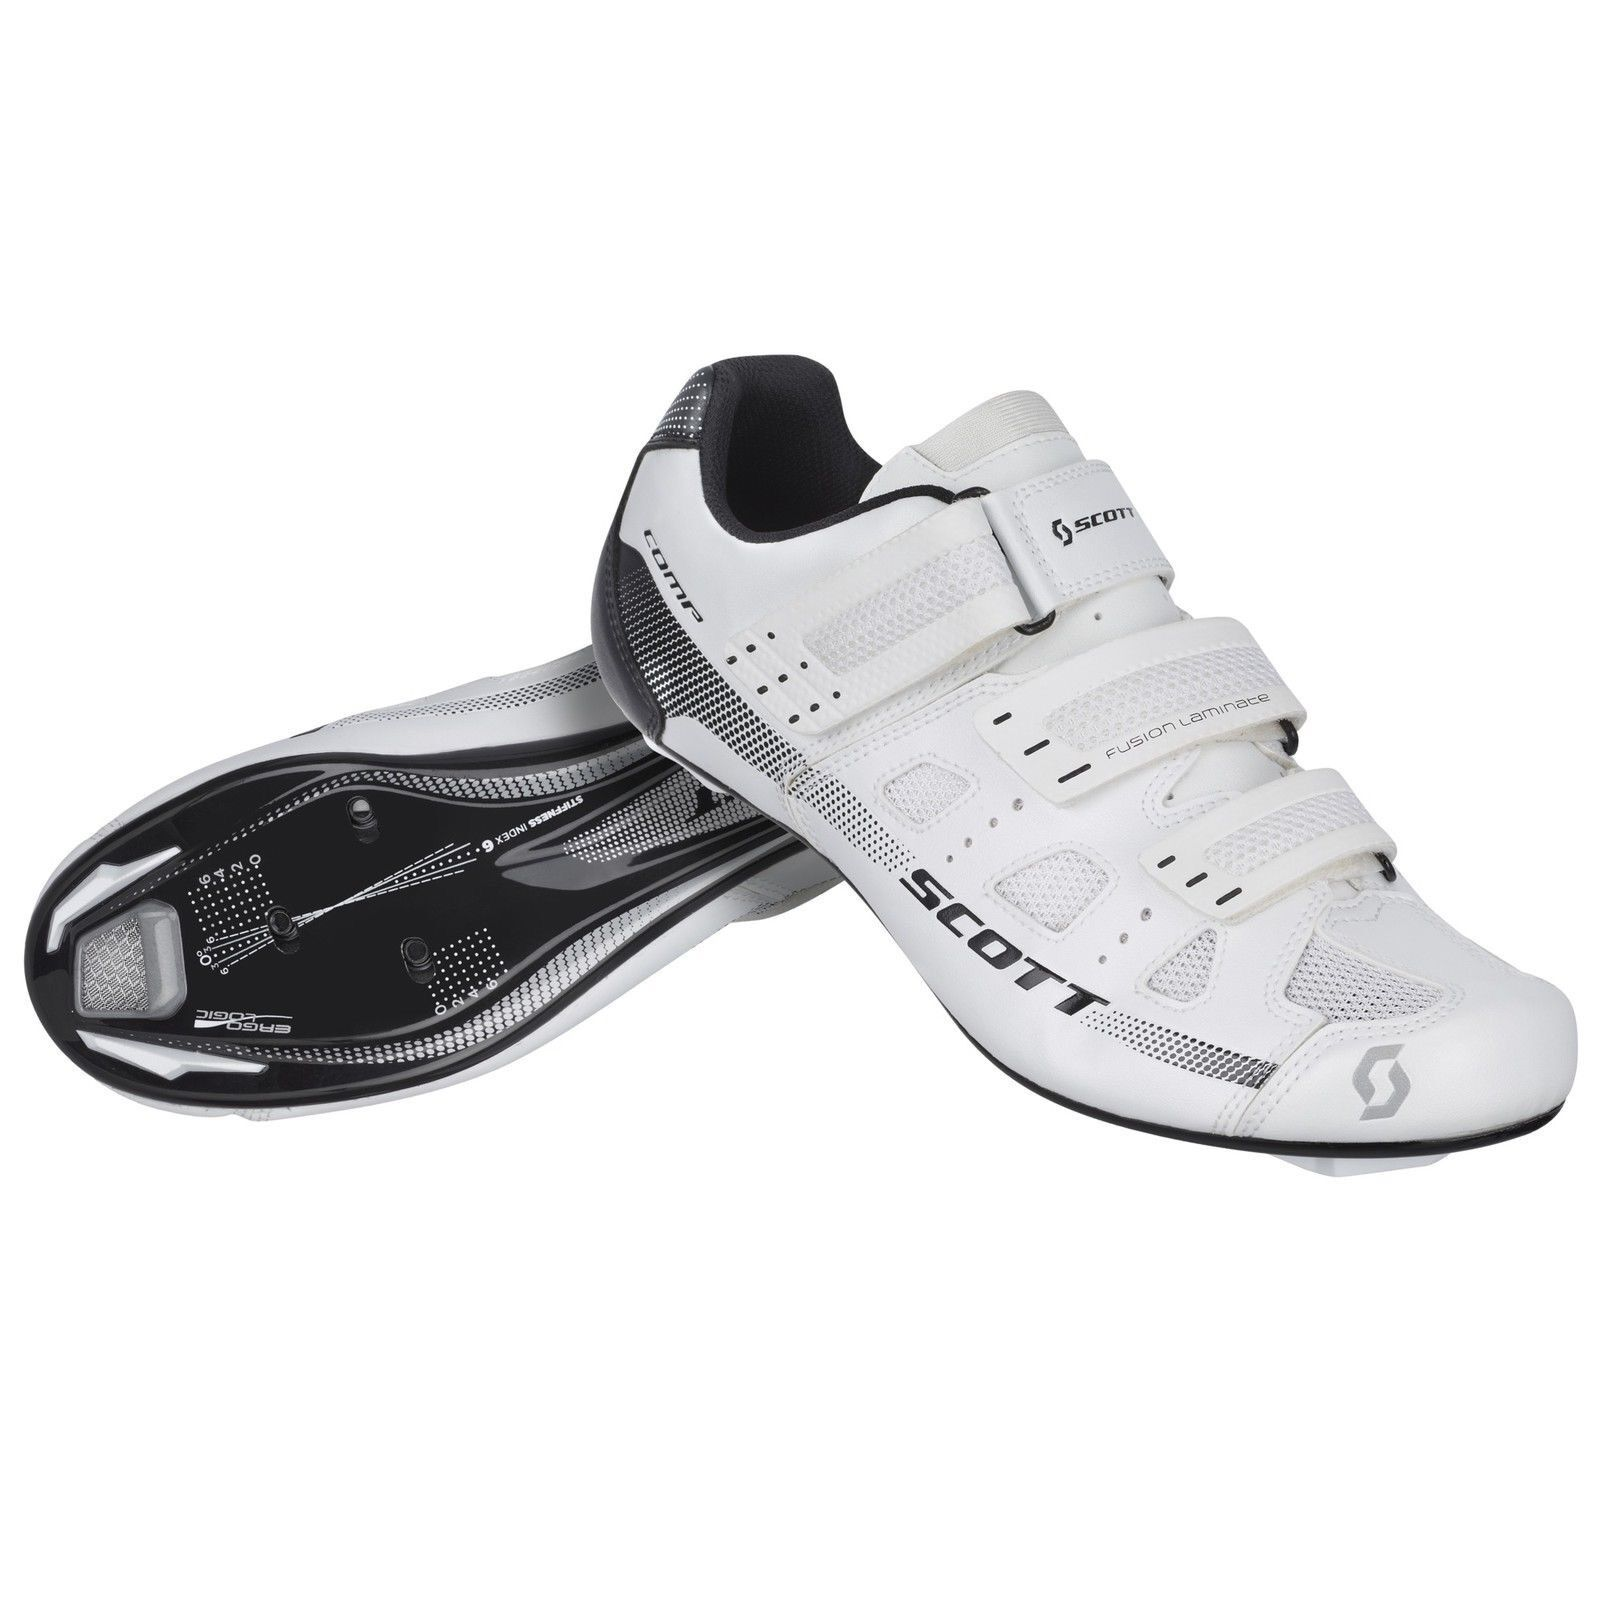 shoes SCOTT ROAD COMP 2015 color BIANCO taglia 41